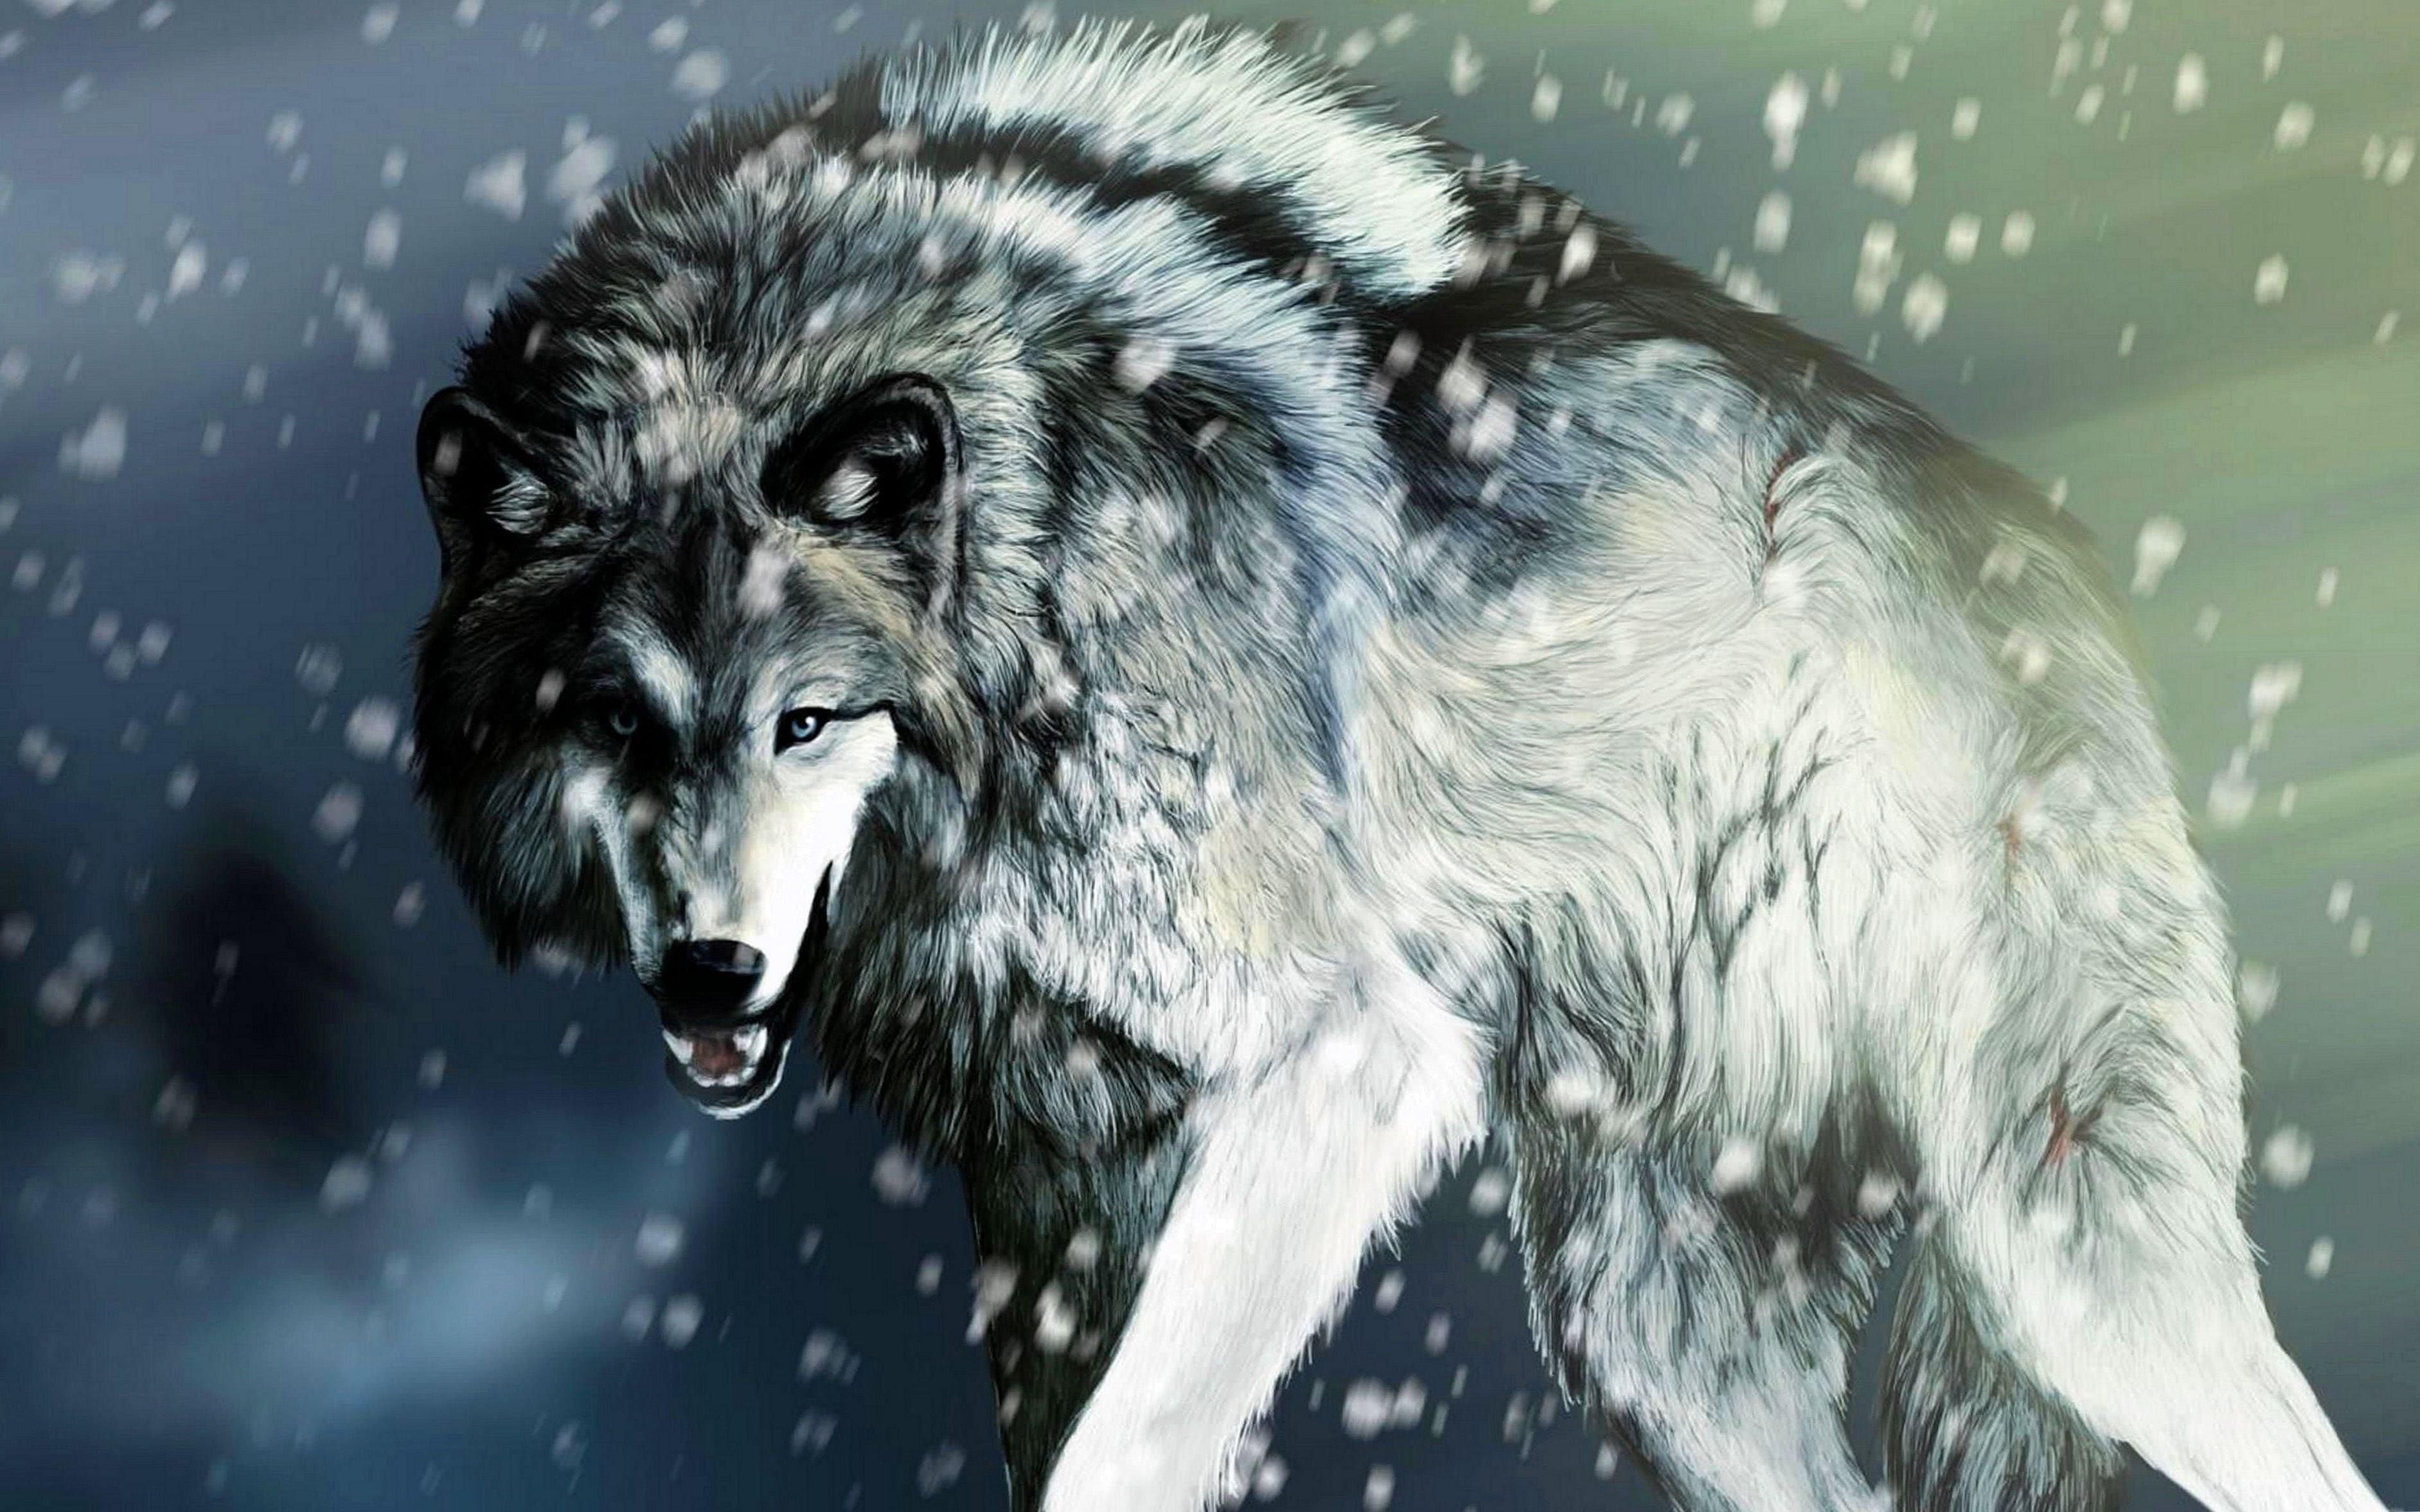 Predator Wolf Wallpapers 4K